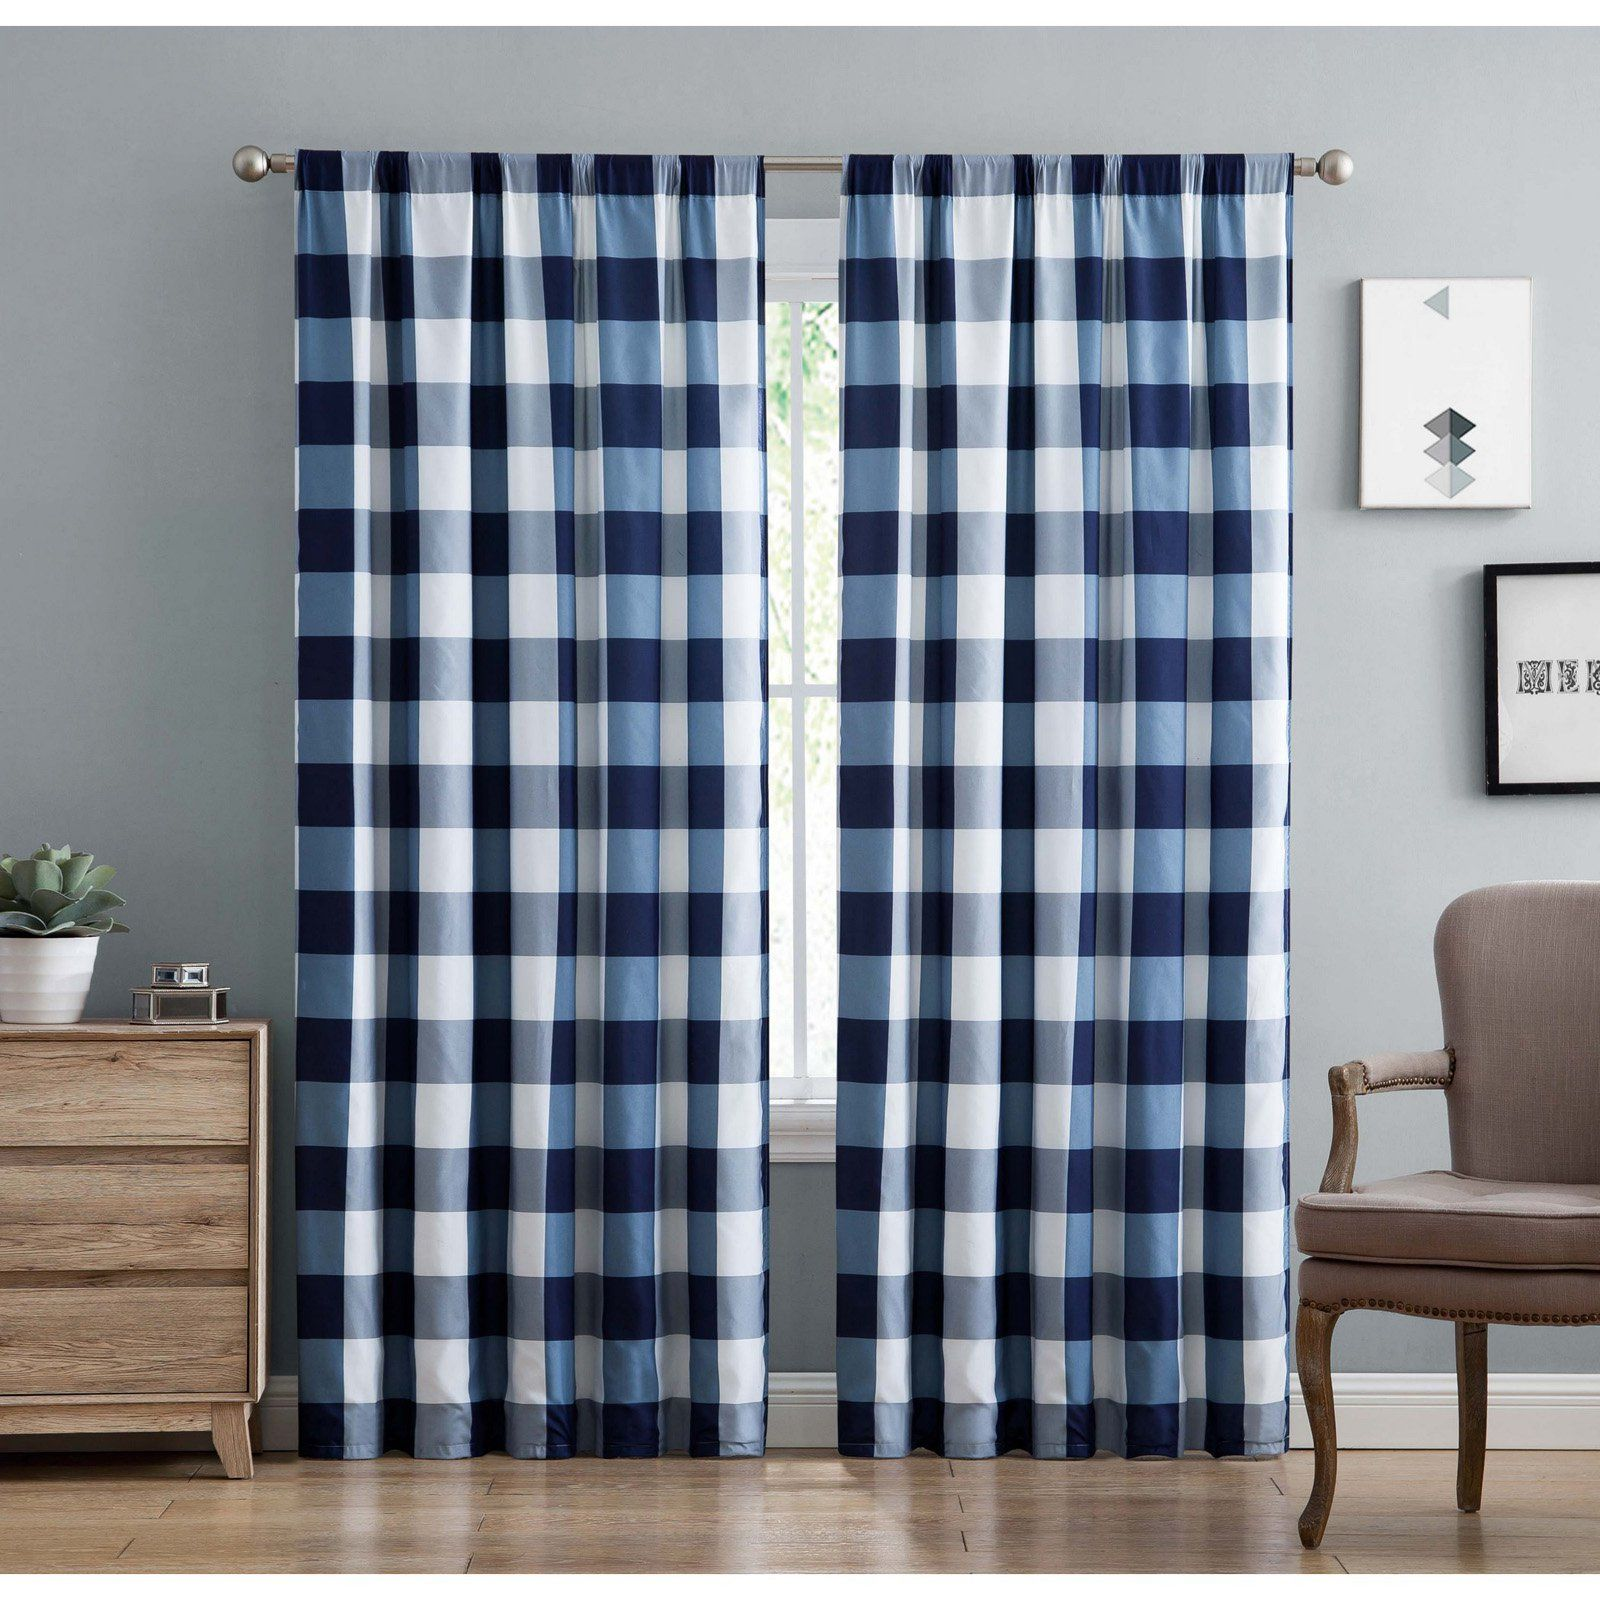 Everyday Buffalo Plaid Curtain Panel Pair By Truly Soft Buffalo